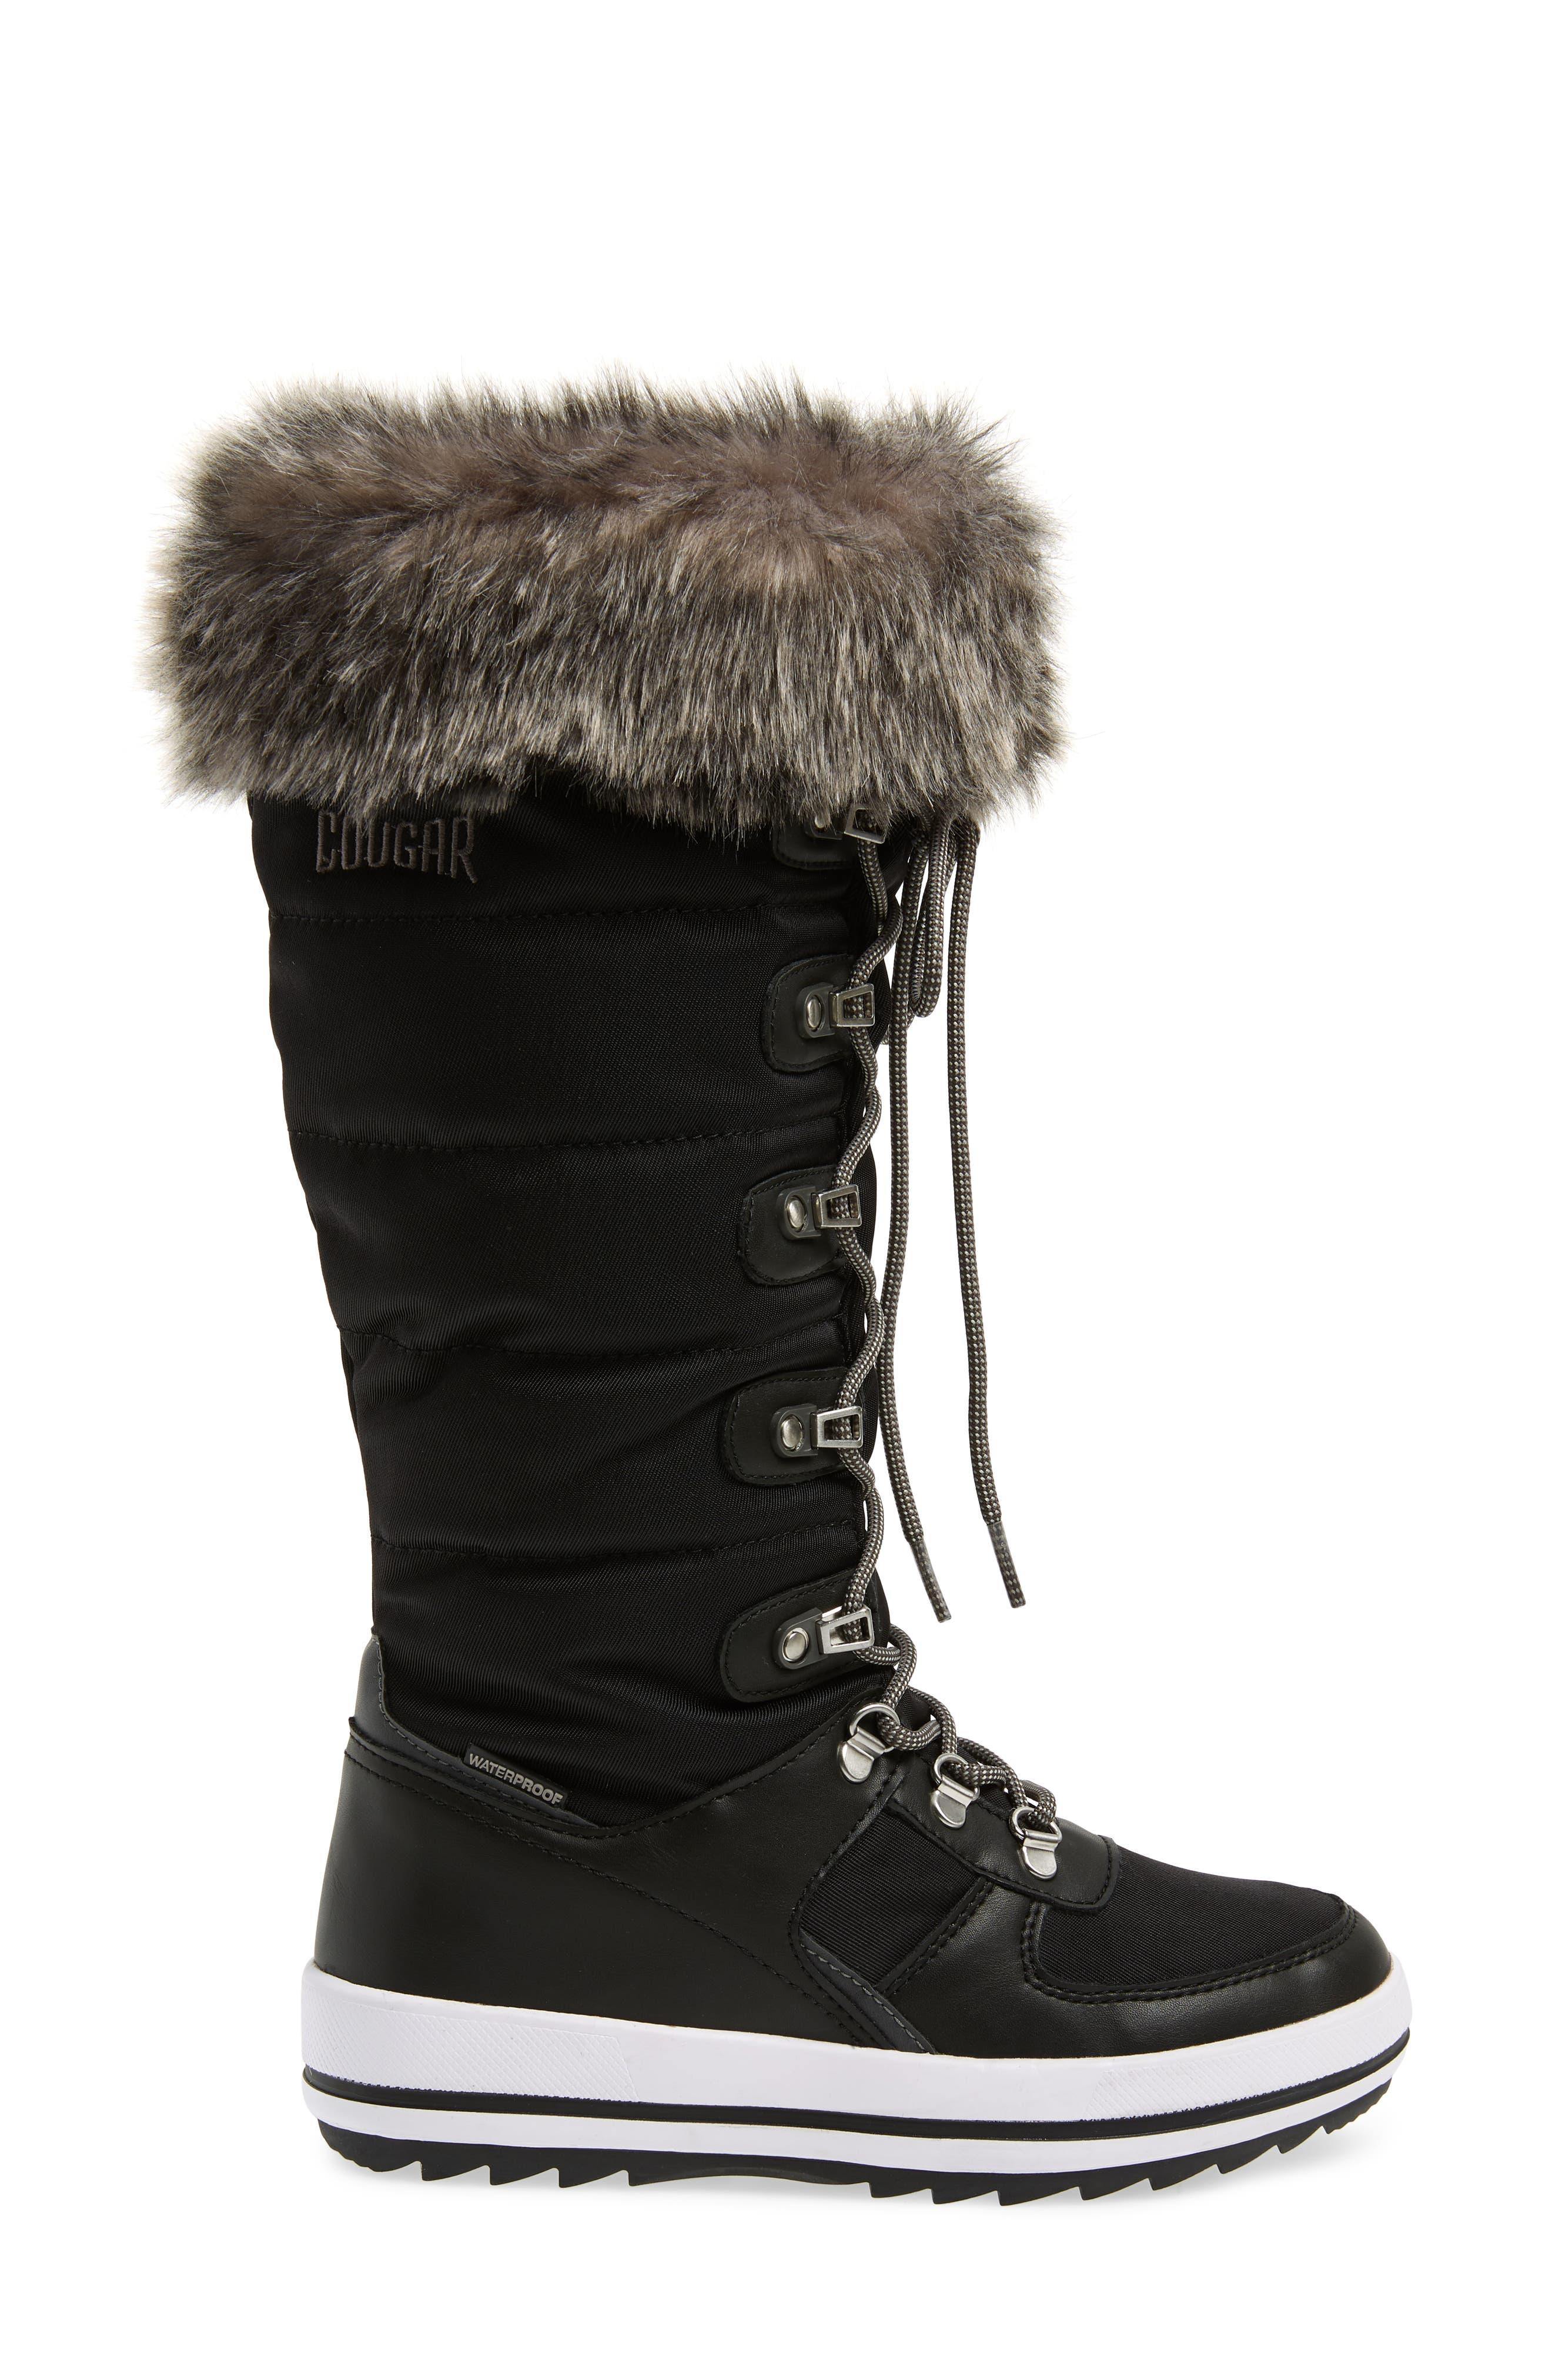 COUGAR, Vesta Faux Fur Collar Knee High Snow Boot, Alternate thumbnail 3, color, BLACK FABRIC